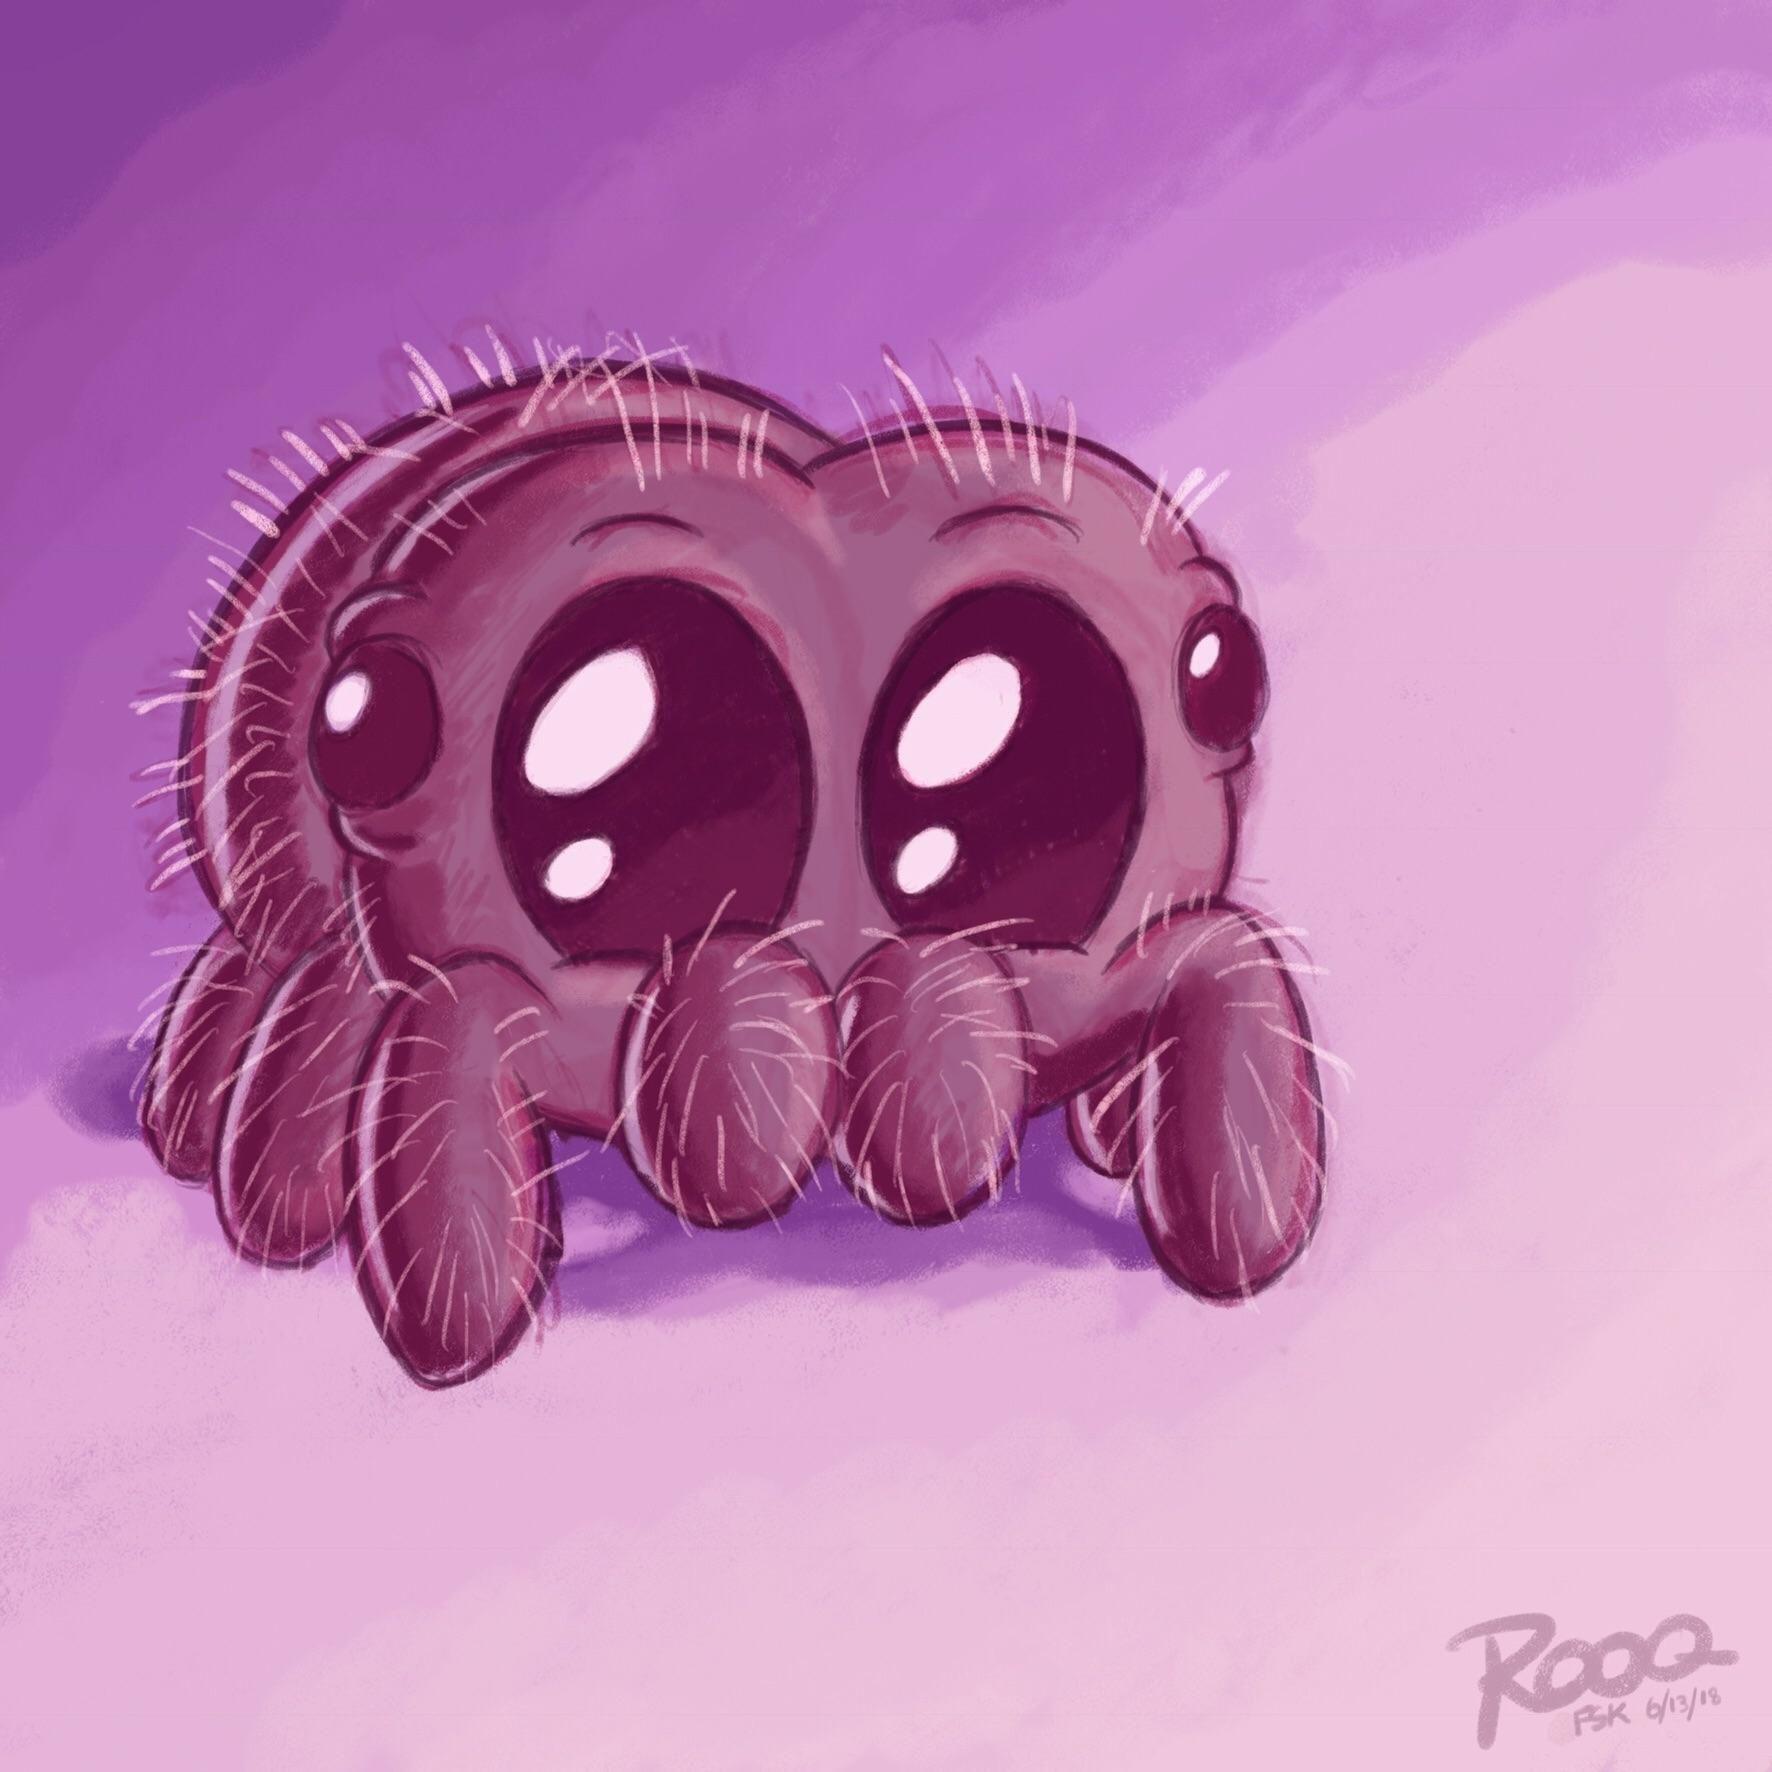 Fanart Lucas The Spider Https Ift Tt 2hn5hv1 Spider Drawing Lucas The Spider Spider Art